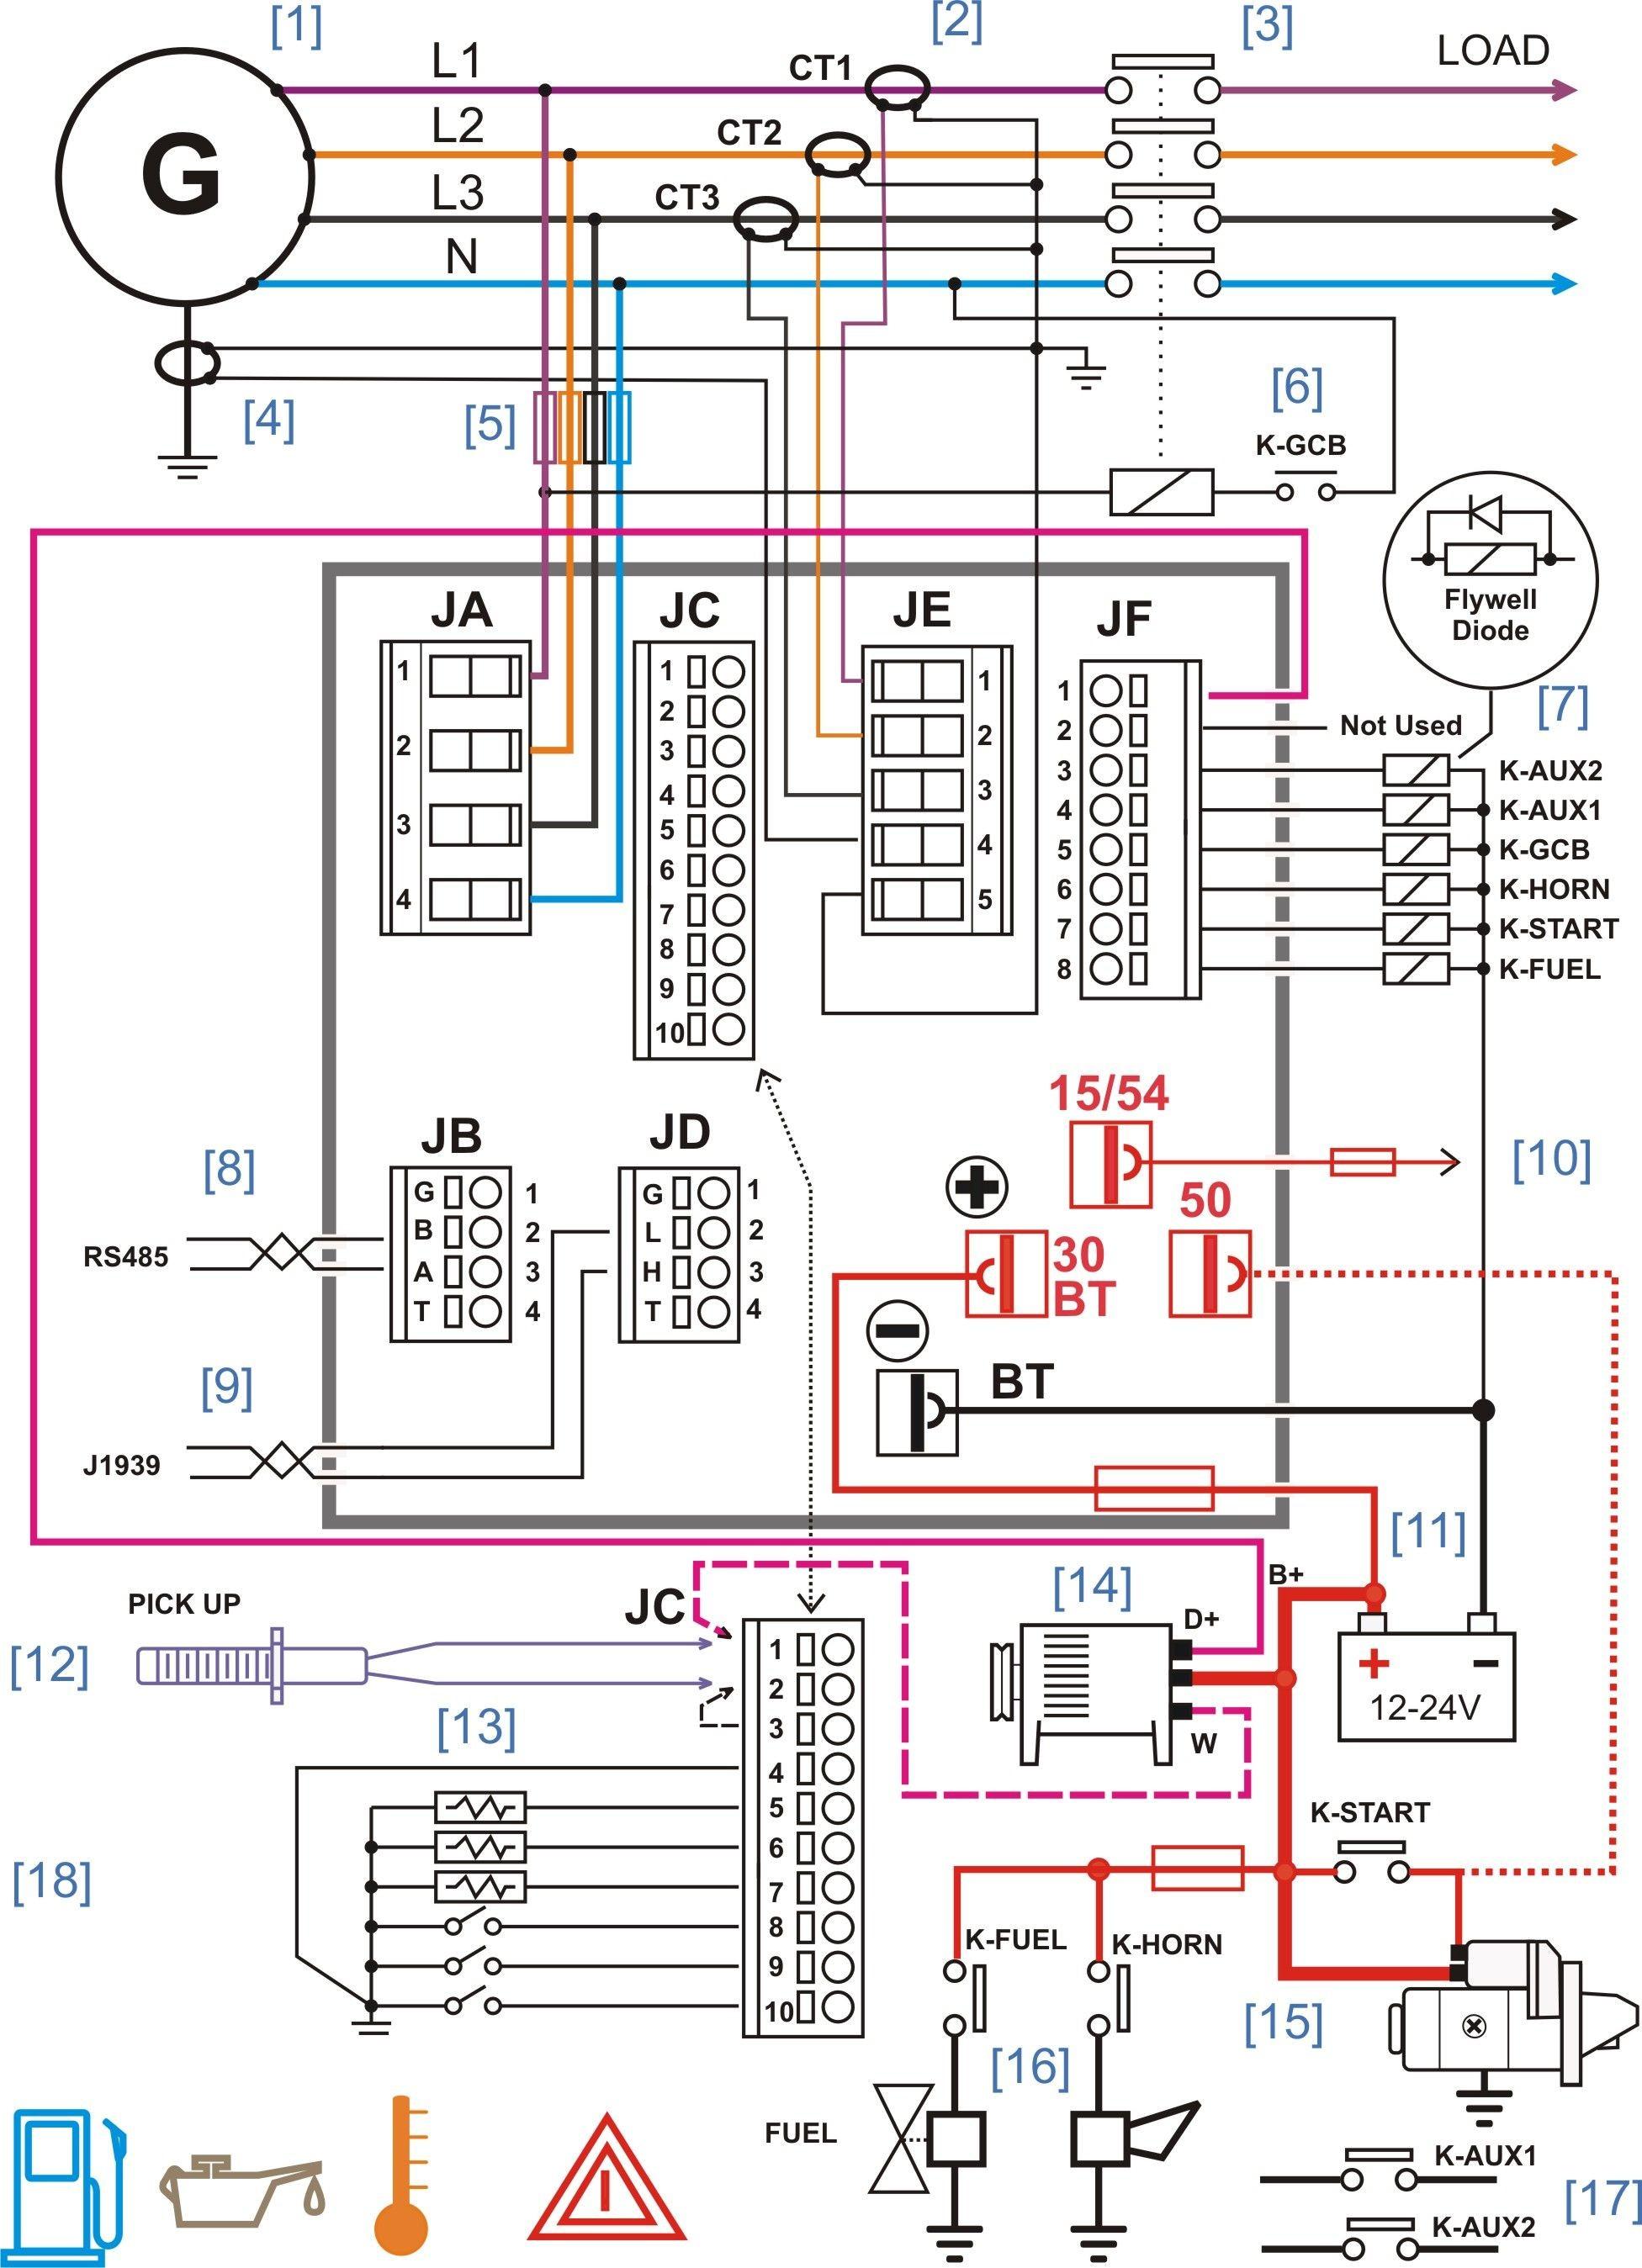 Home Generator Transfer Switch Wiring Diagram Diesel Generator Control Panel Wiring Diagram Of Home Generator Transfer Switch Wiring Diagram